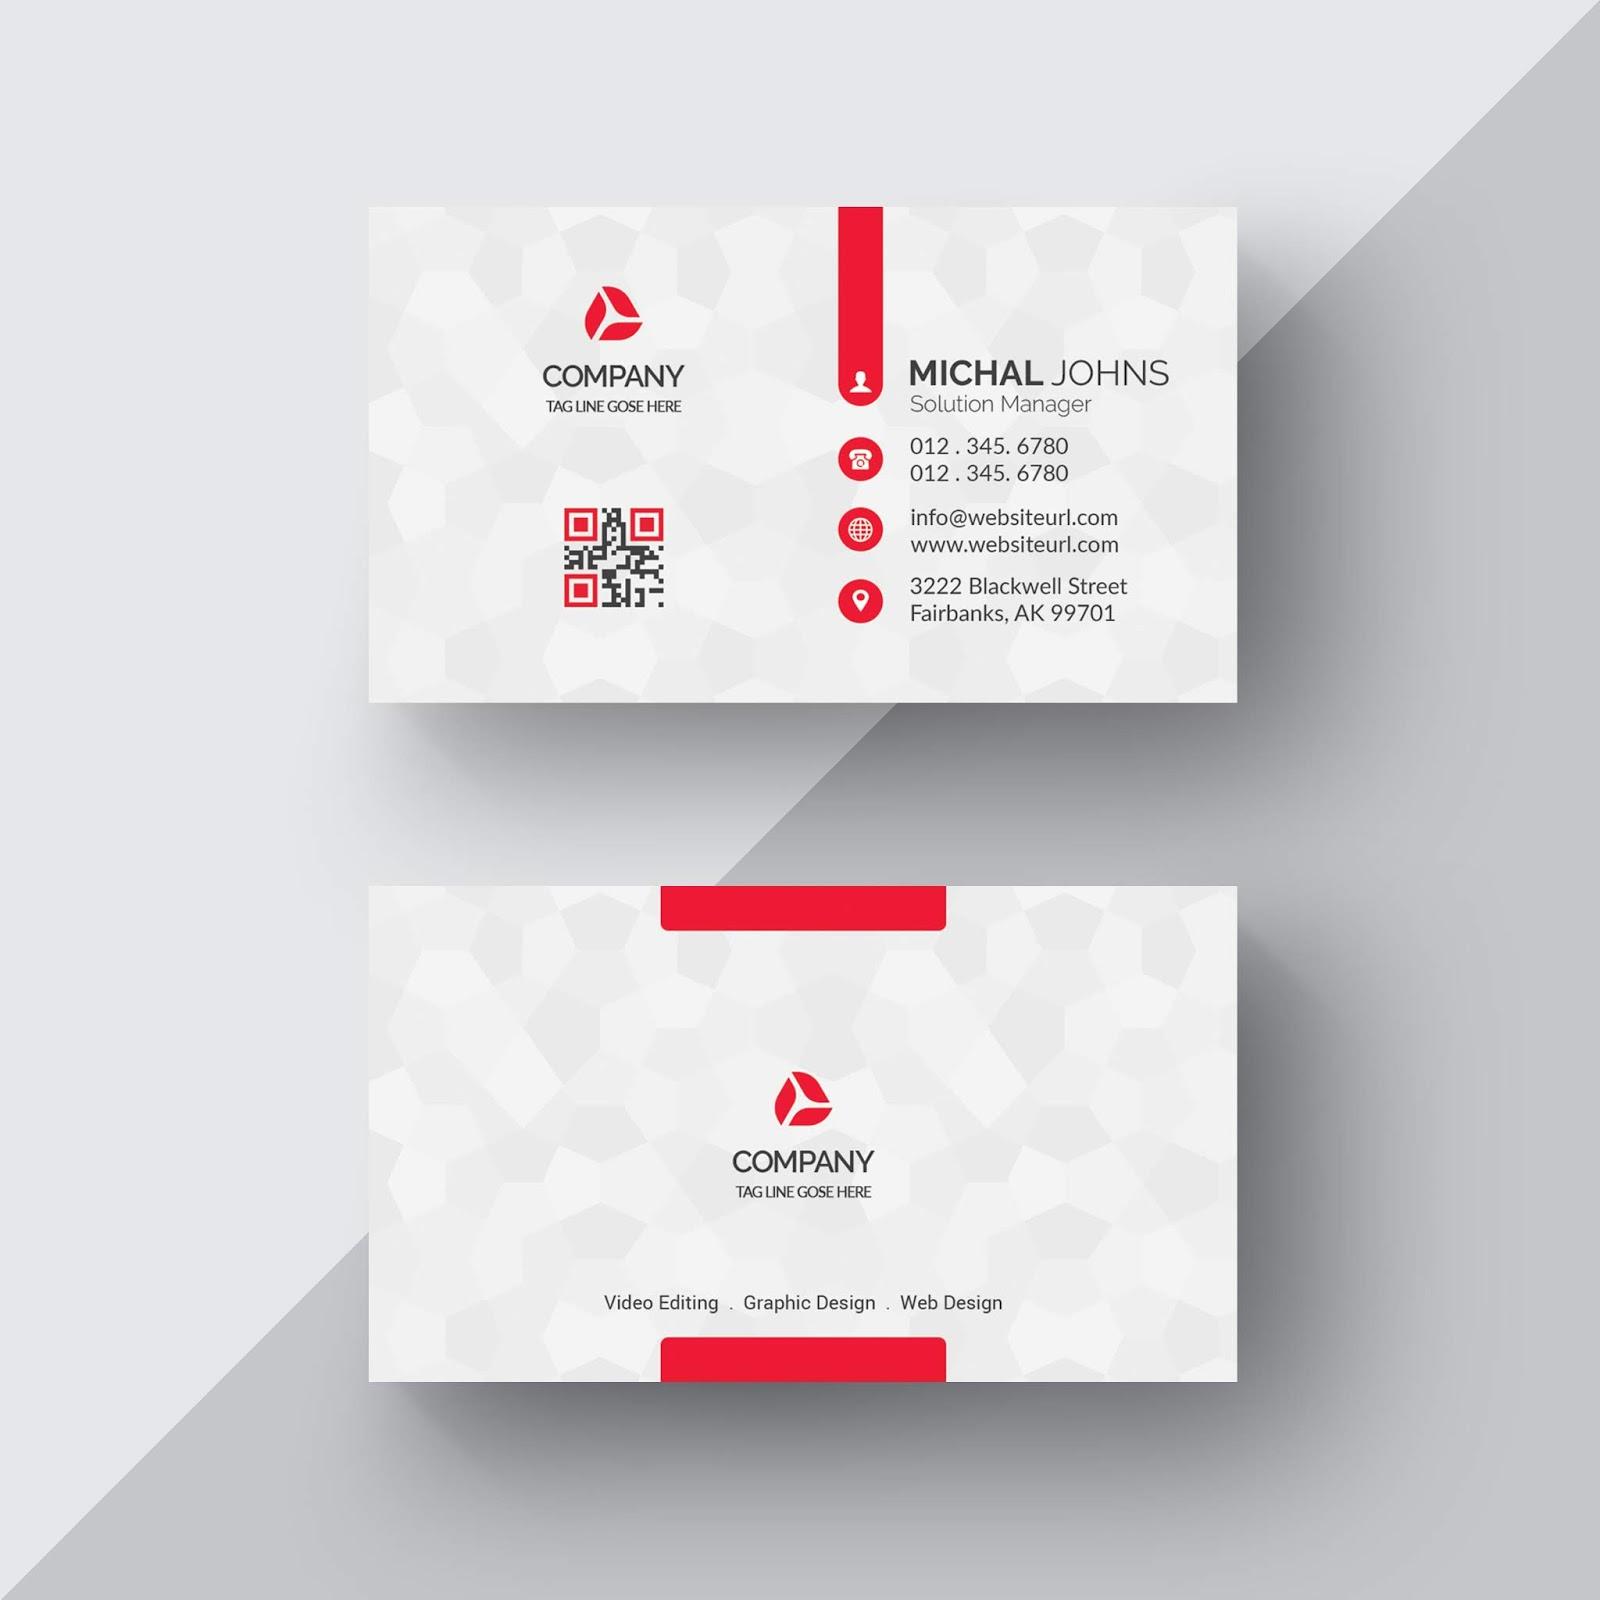 تحميل ملف Psd Business Card جاهز للتعديل على الفوتوشوب White